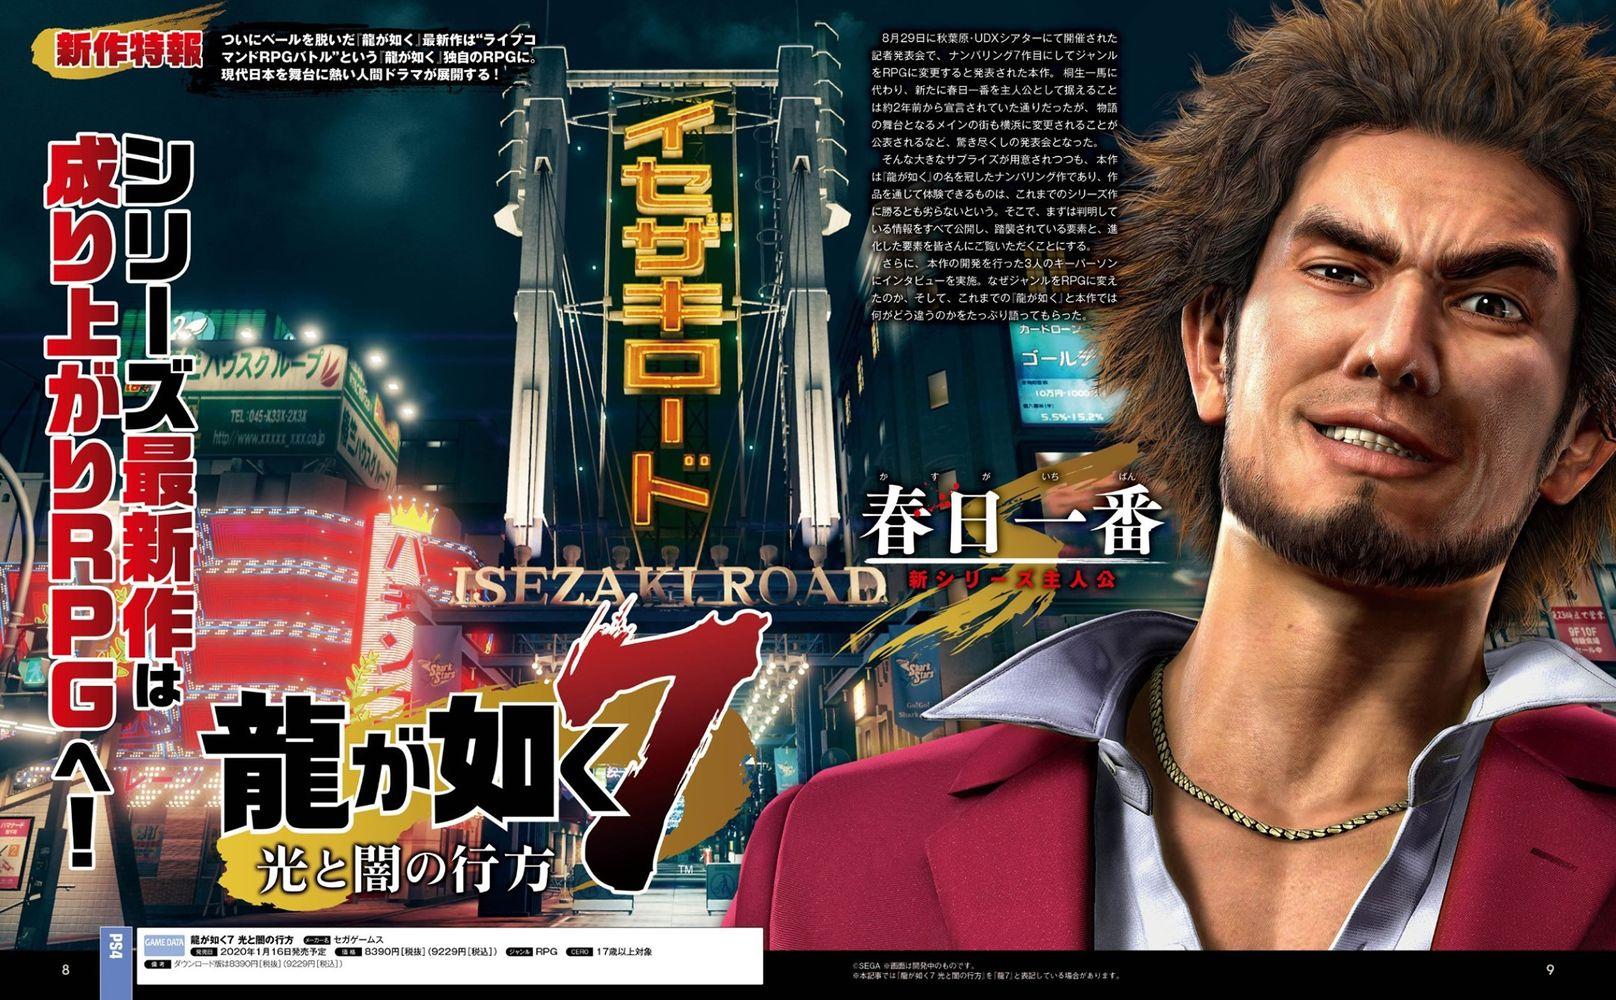 Yakuza 7: tante nuove informazioni da Famitsu